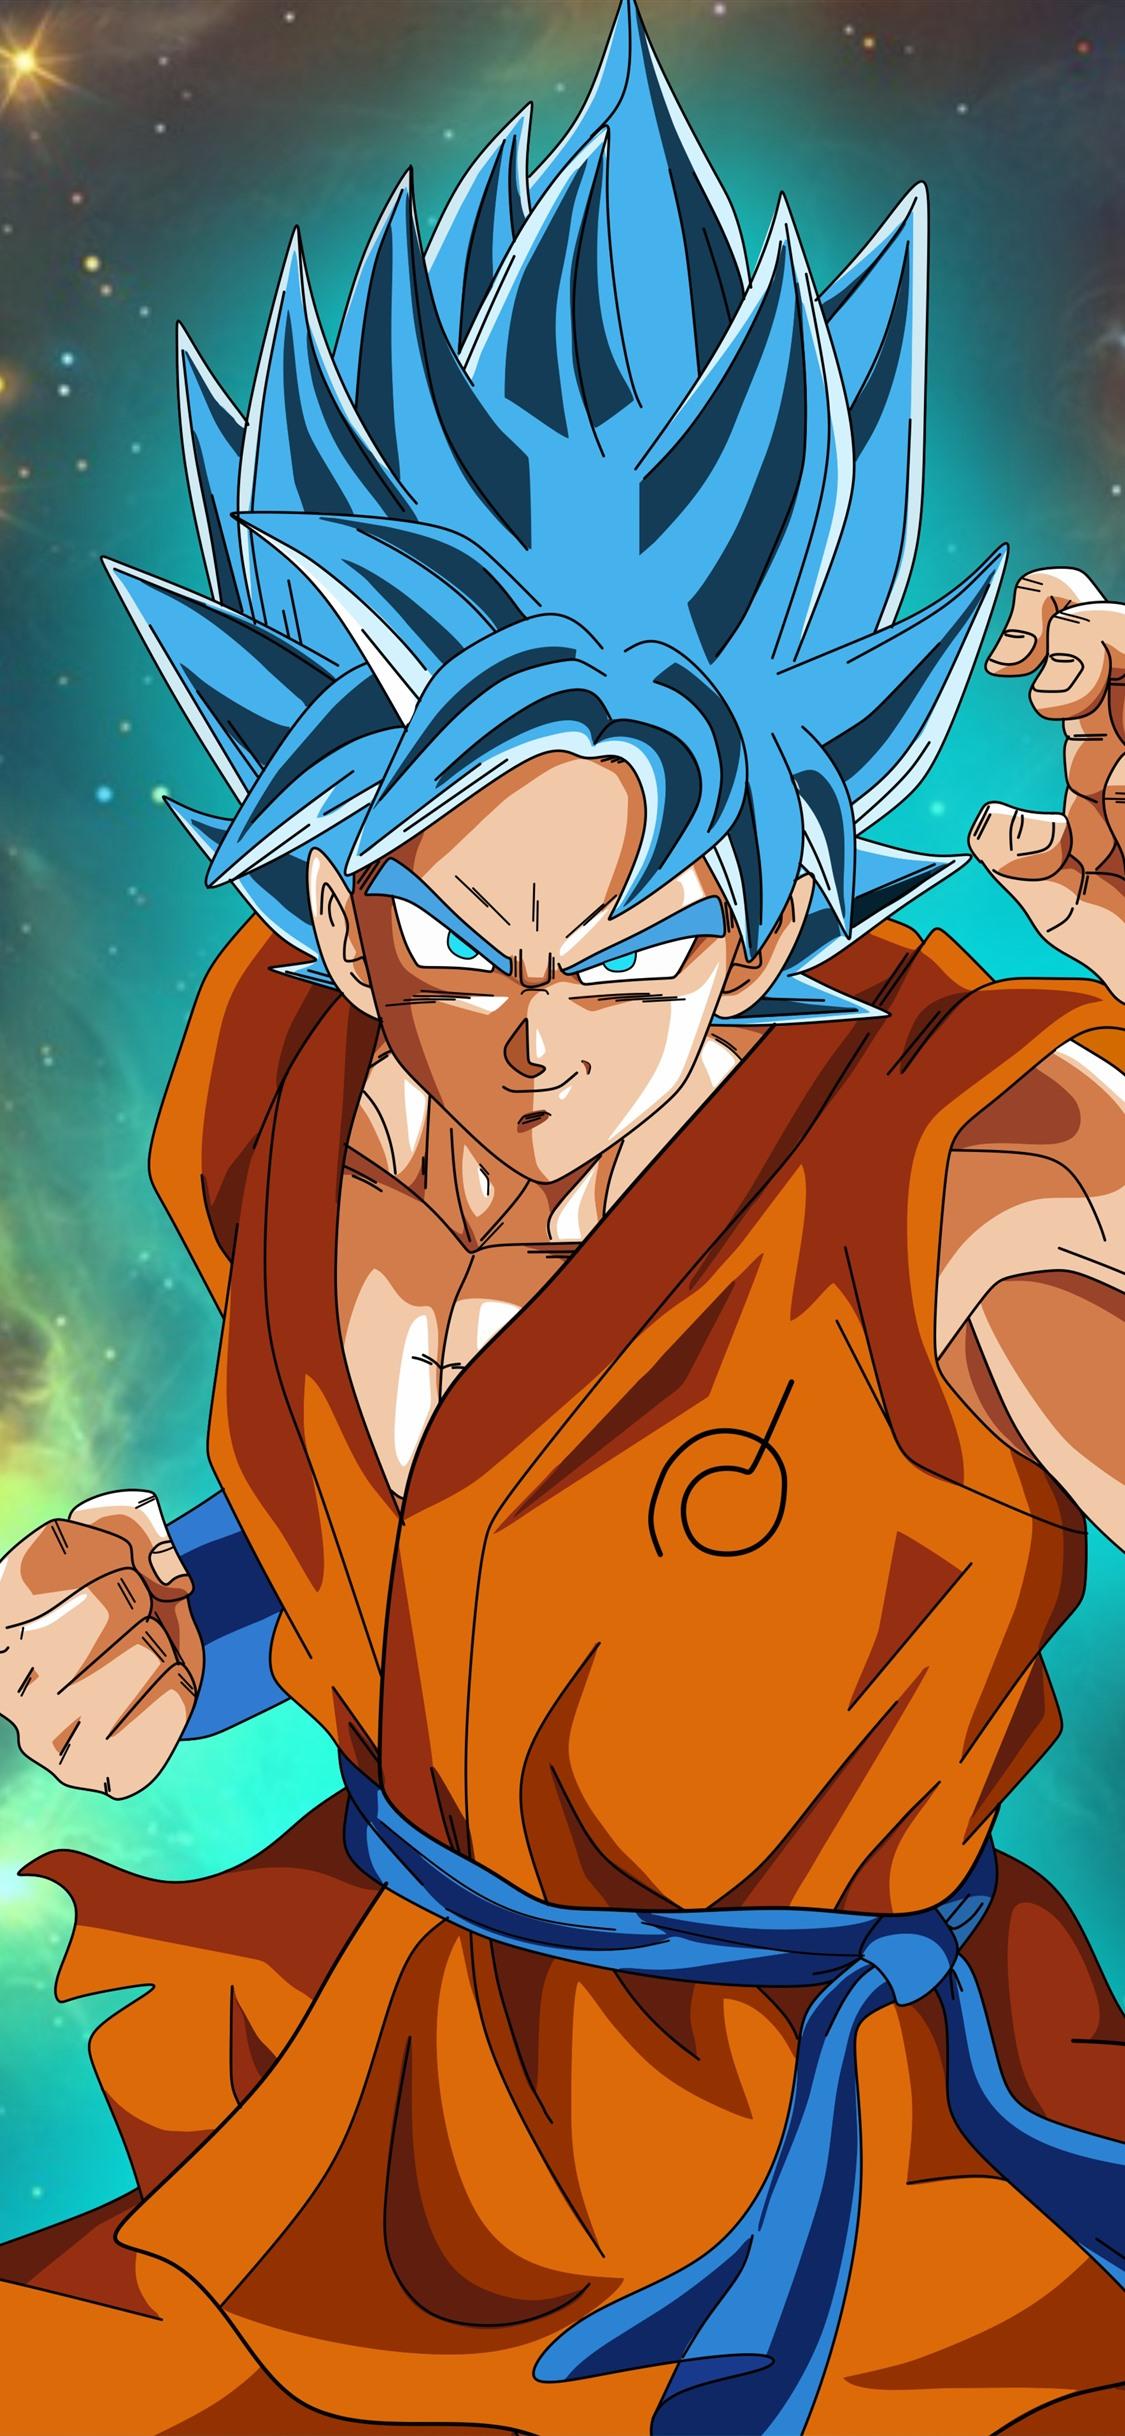 Wallpaper Dragon Ball Super Goku Anime 7680x4320 Uhd 8k Picture Image